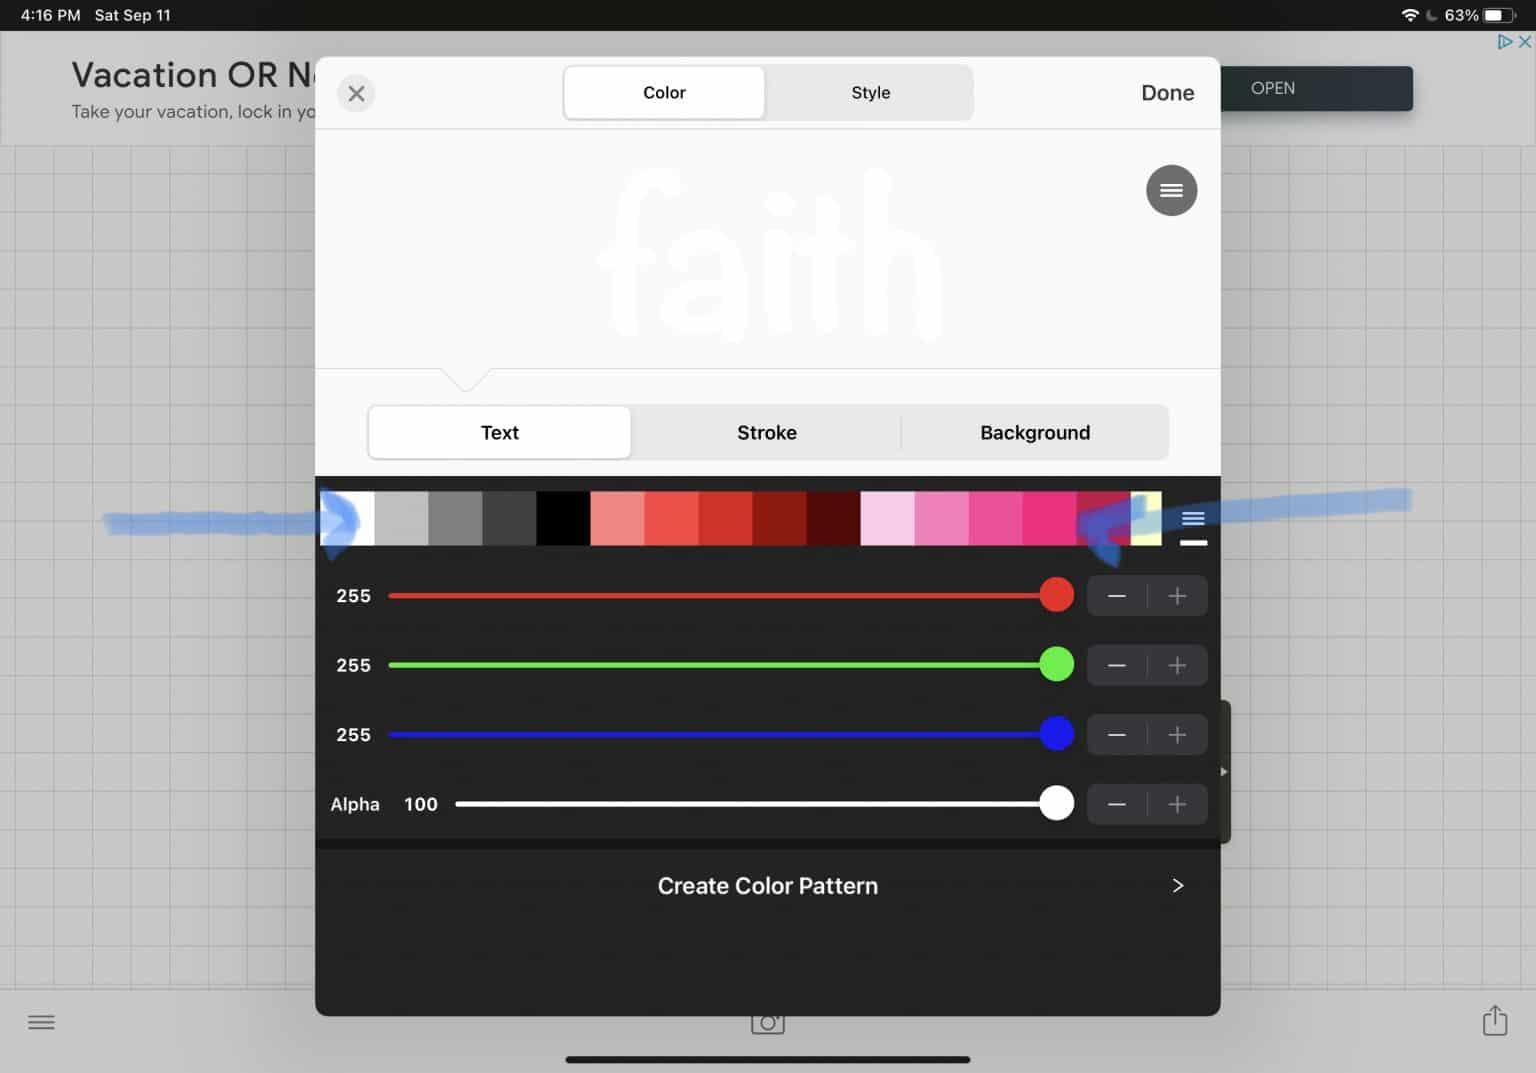 slide color squares to choose color option